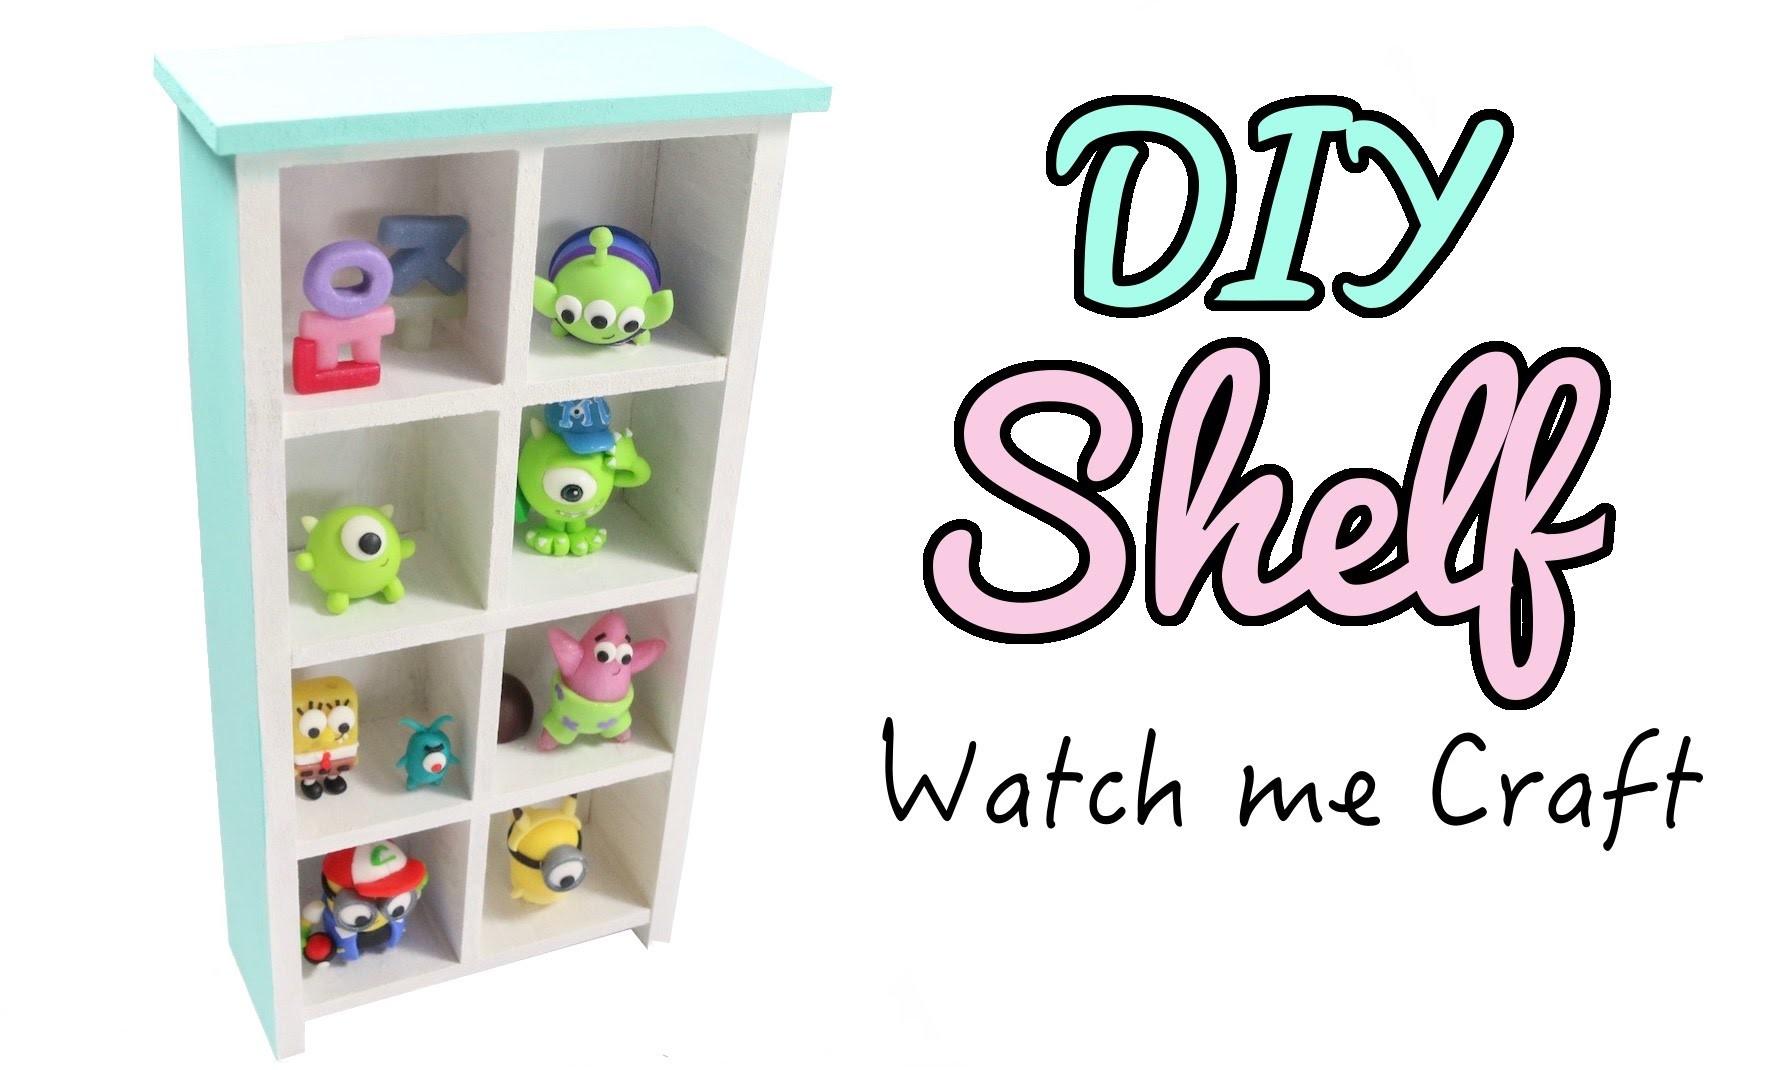 Watch Me Craft: DIY Wood Bookshelf Tutorial